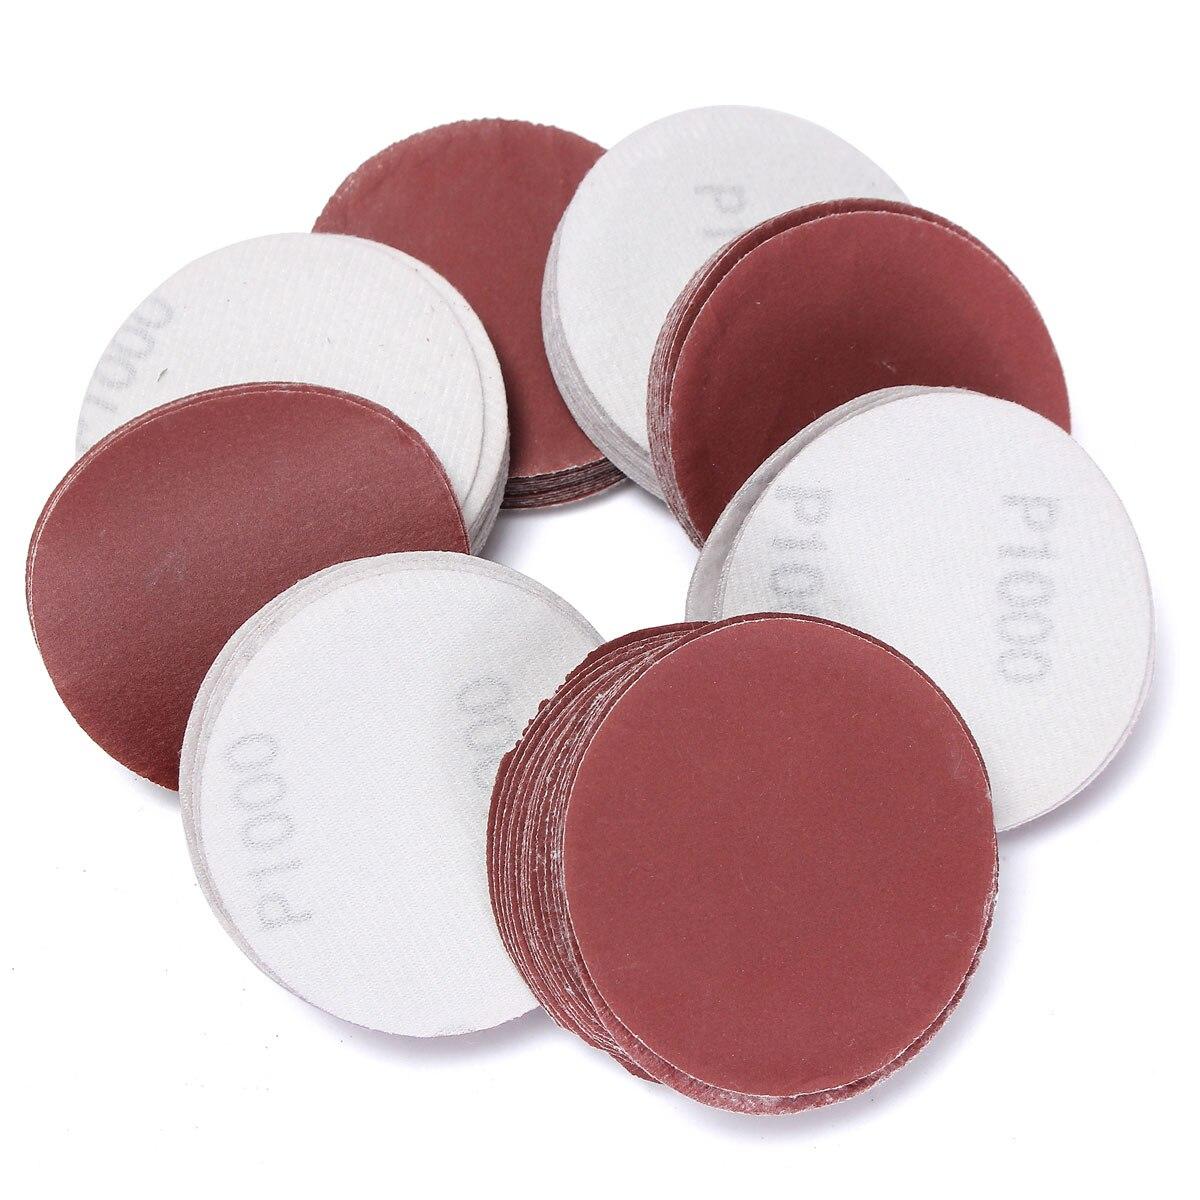 100pcs 75mm 1000g Grit Abrasive Sand Discs Sandpaper Sanding Polishing Pad Smooth Cleaning